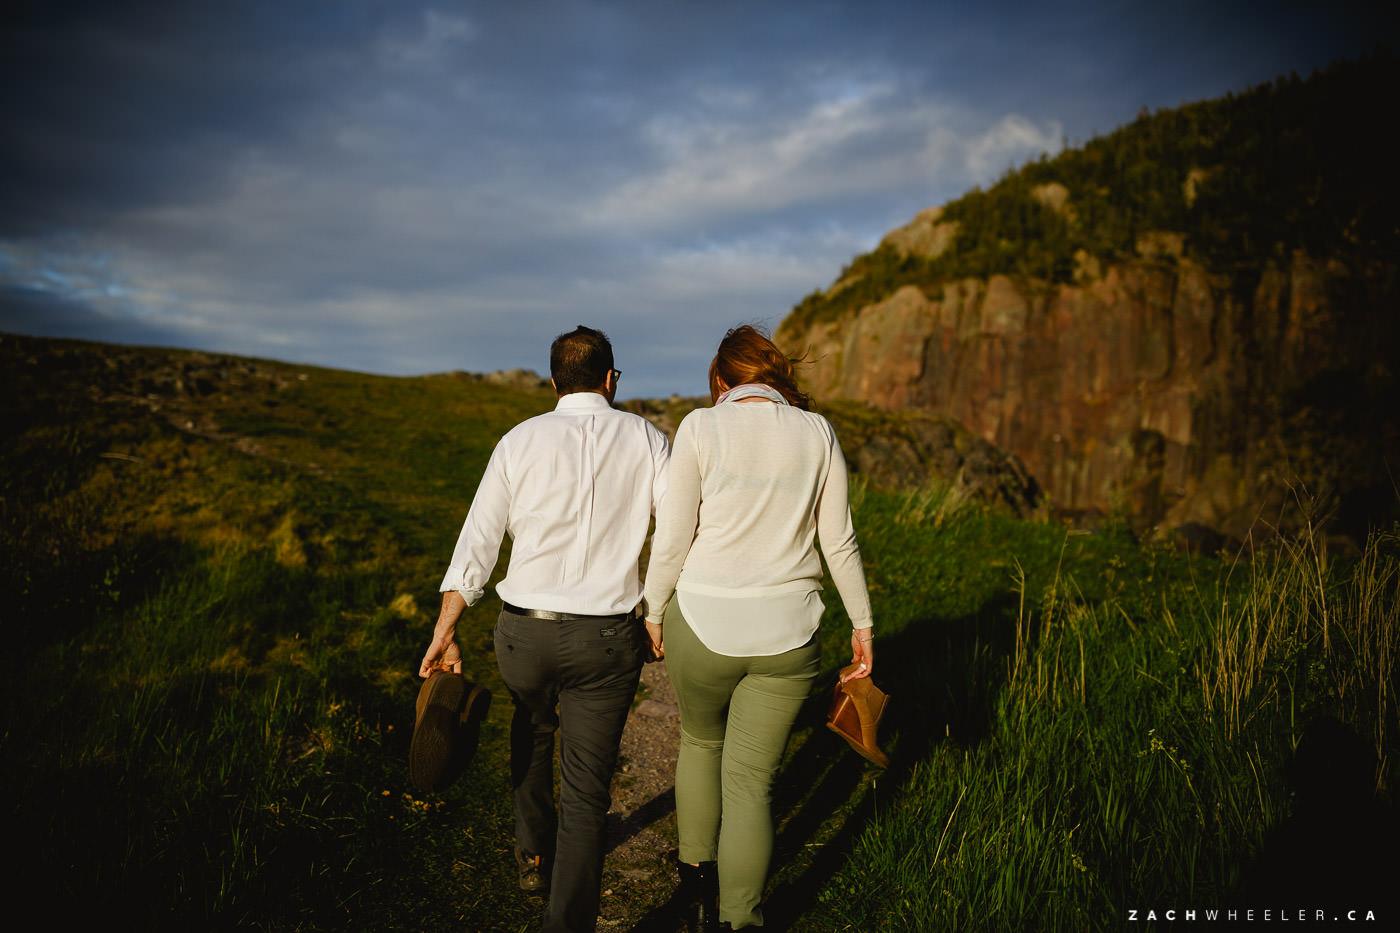 Kim-Dan-Engagement-Photography-StJohns-Newfoundland-1